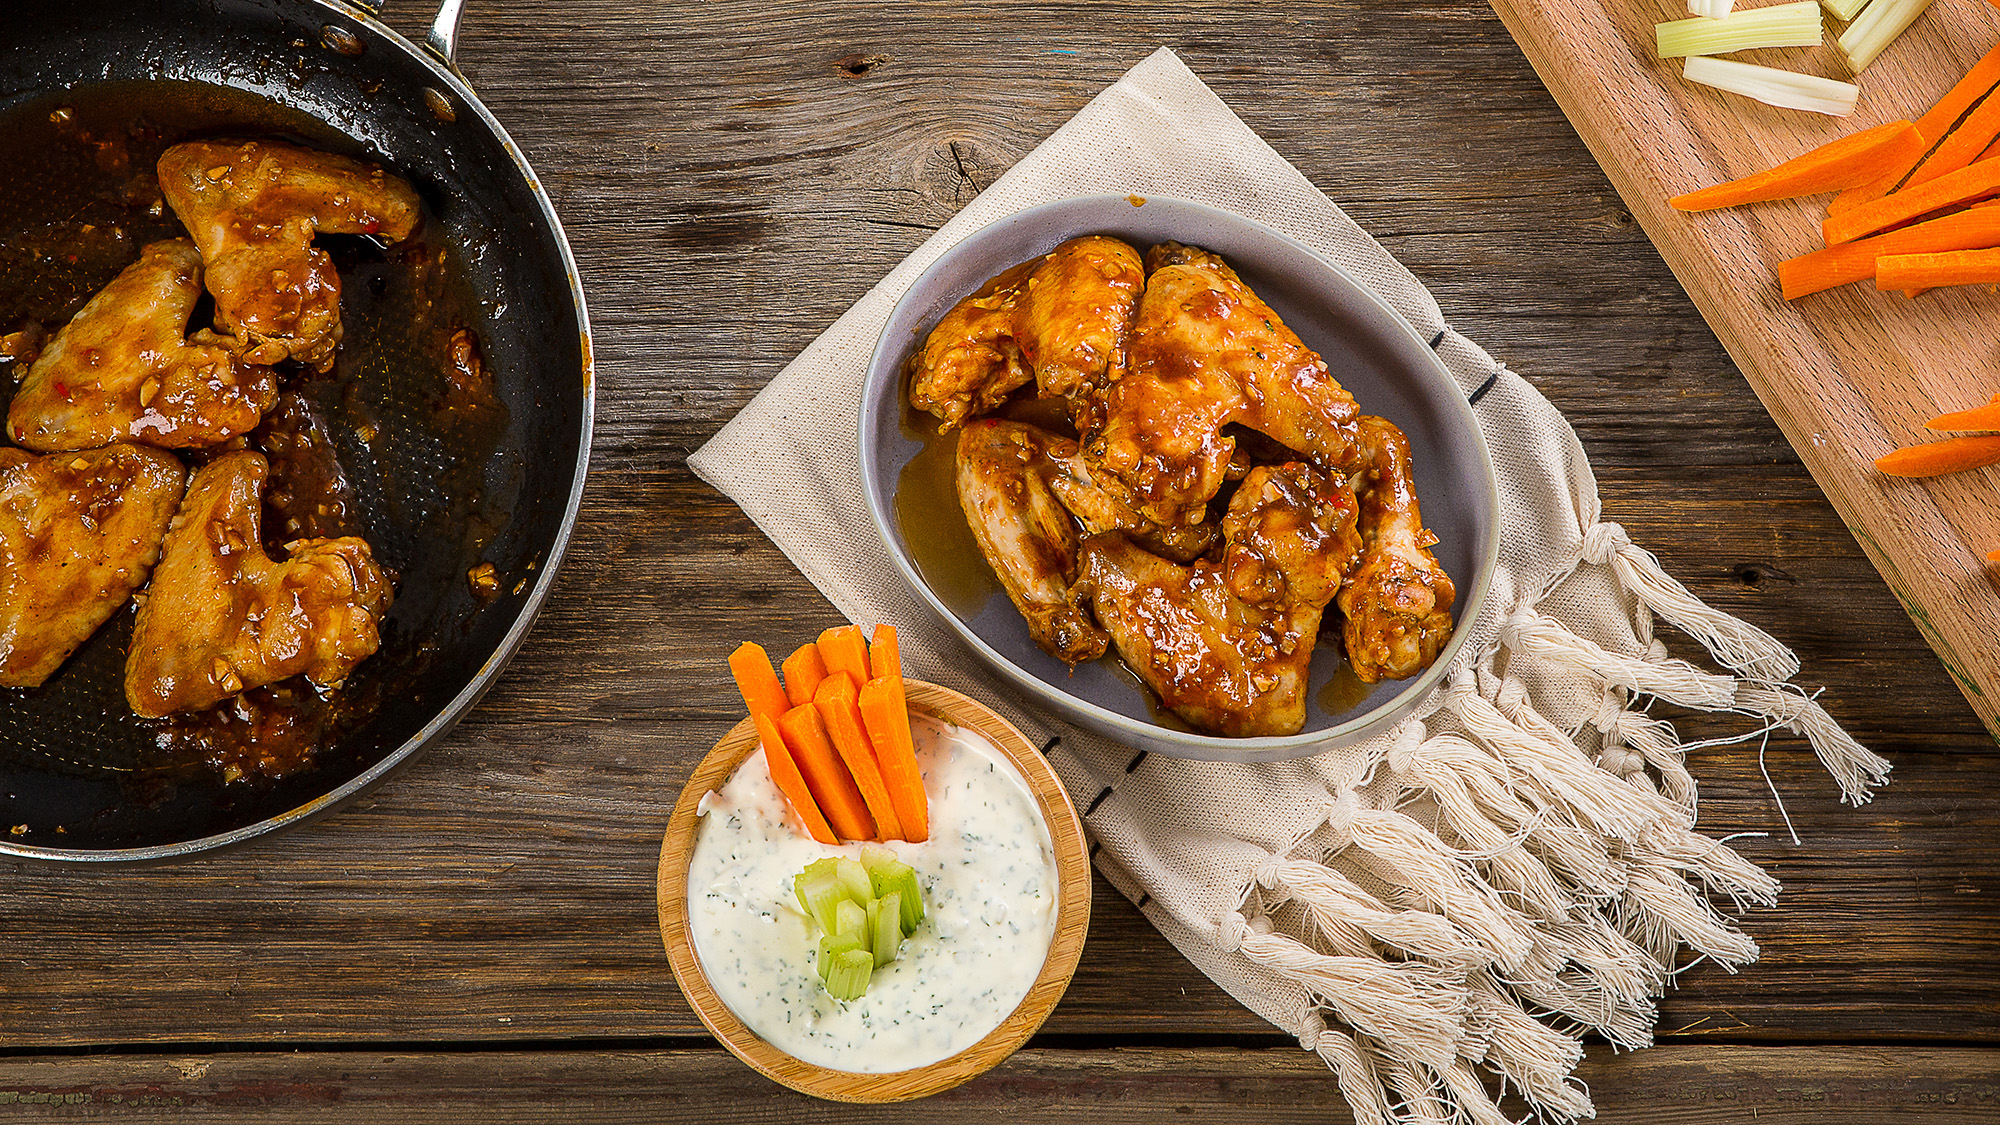 Крылышки баффало с соусом тартар и овощами